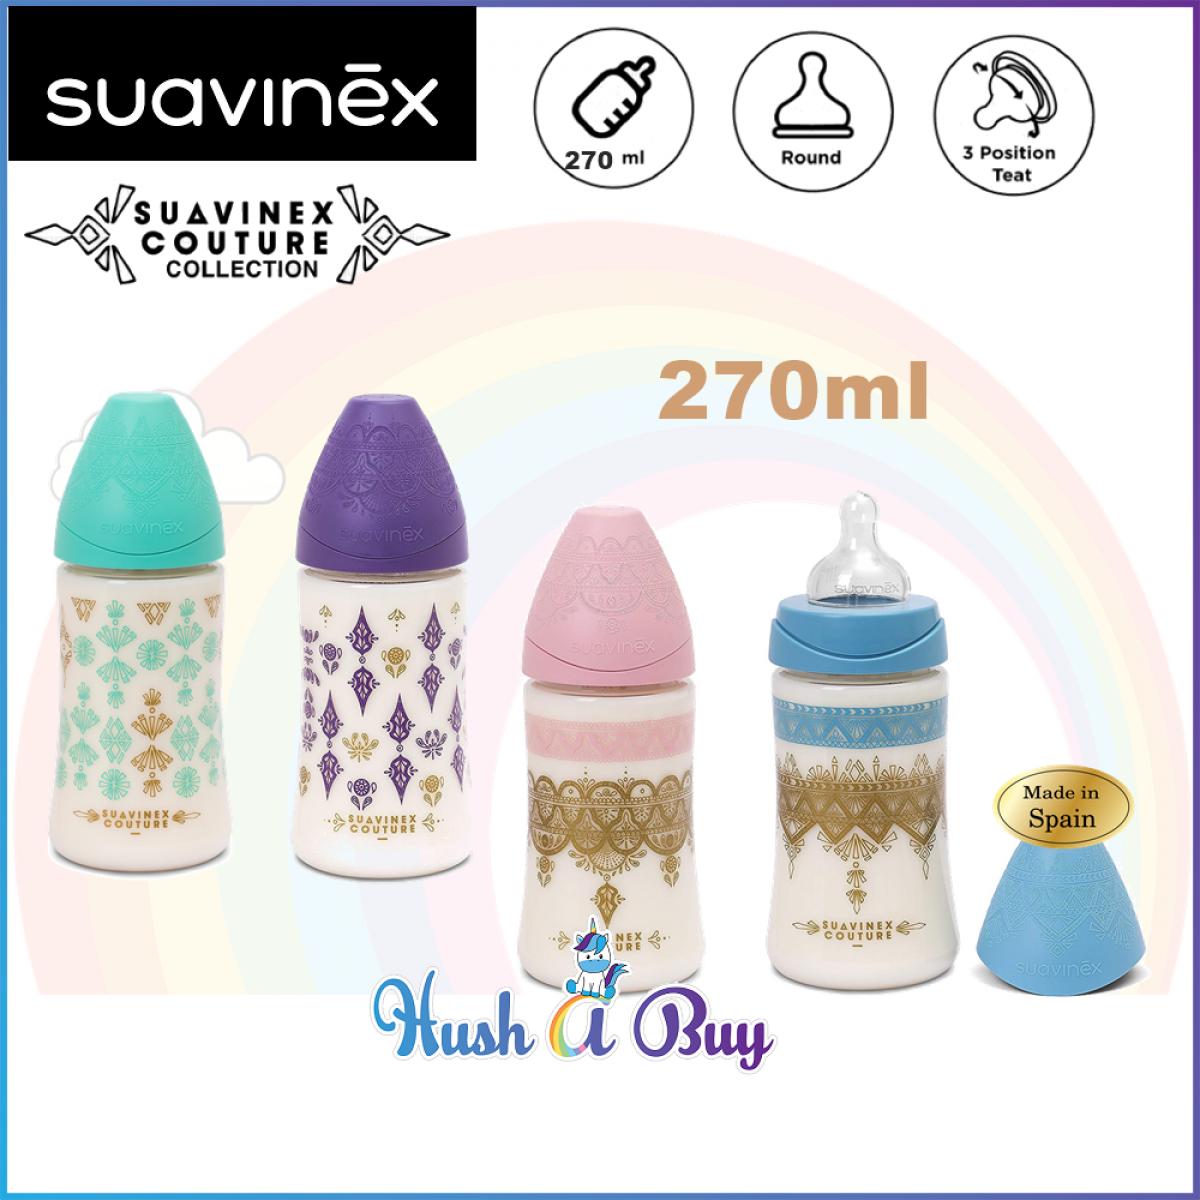 Suavinex Coutour PA Feeding Bottle 0.6M - 270ml